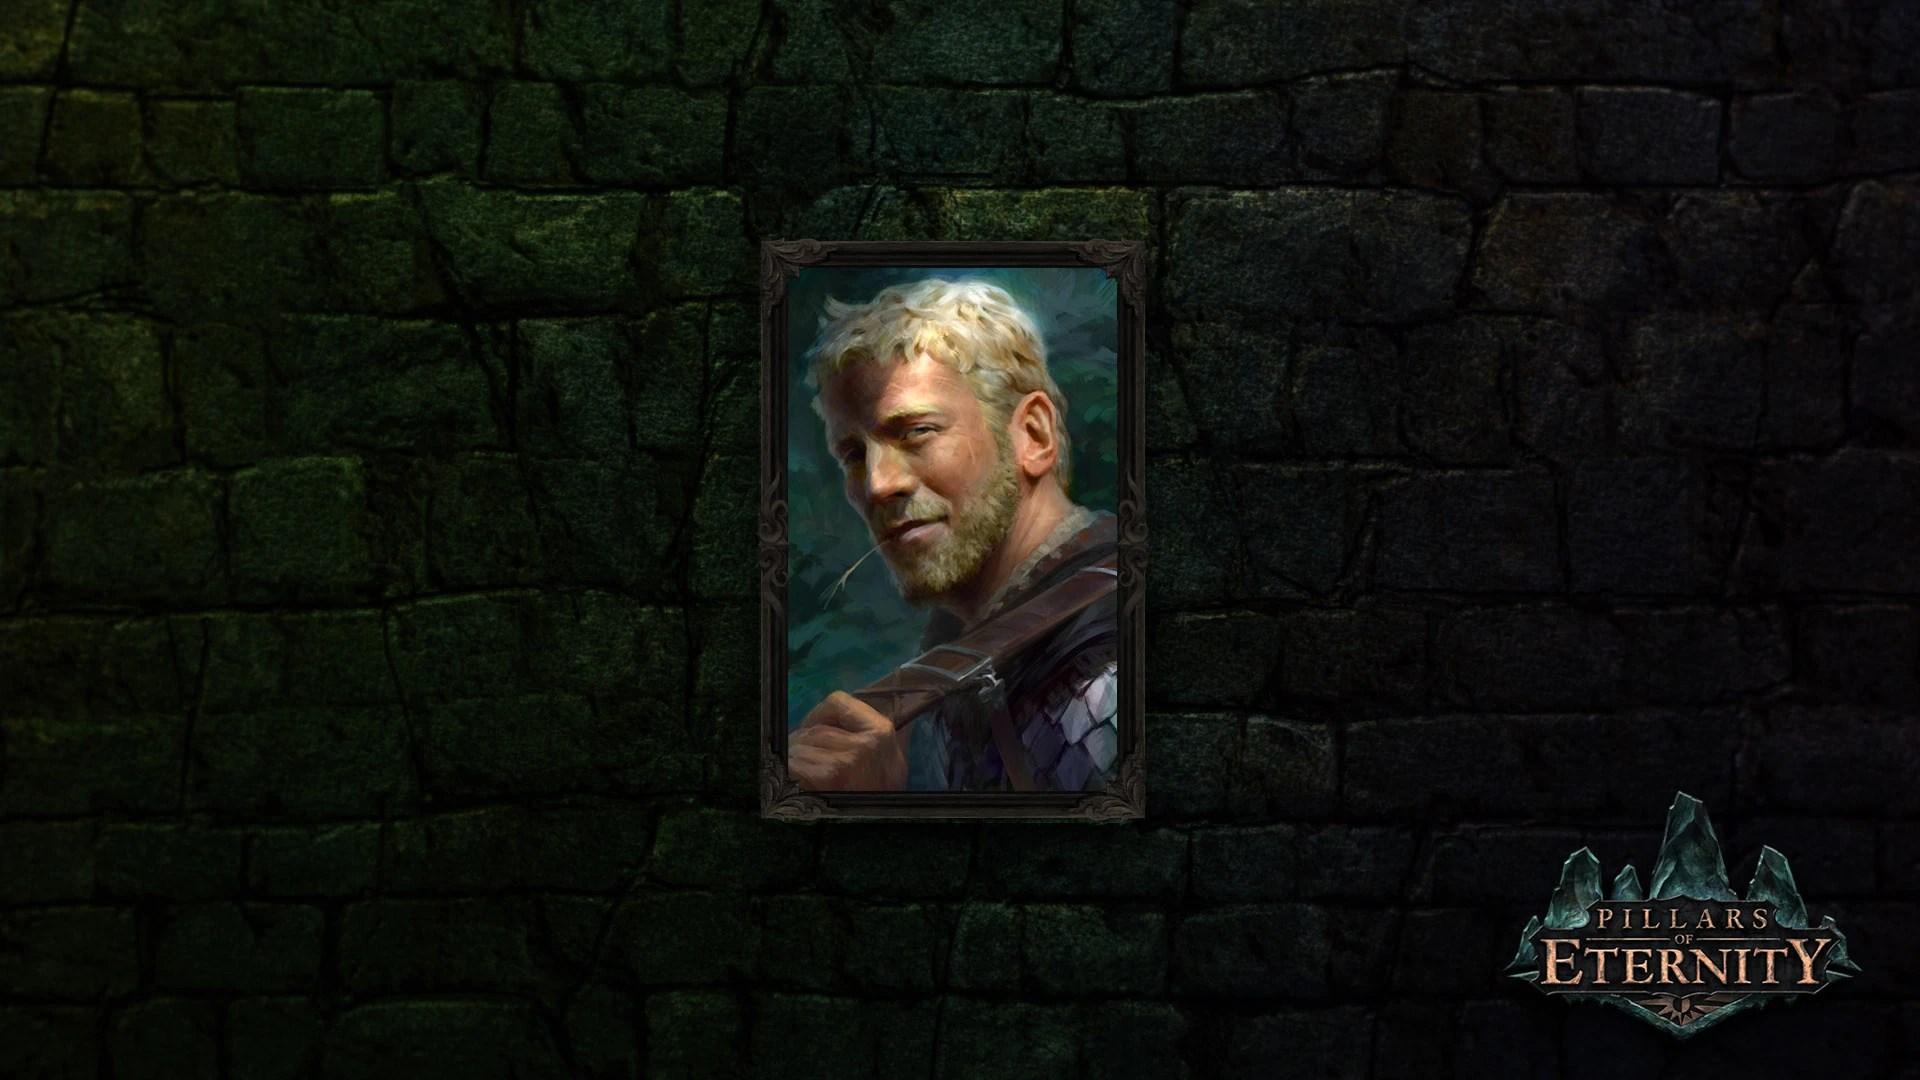 Pillars Of Eternity Edr Steam Trading Cards Wiki Fandom Powered By Wikia